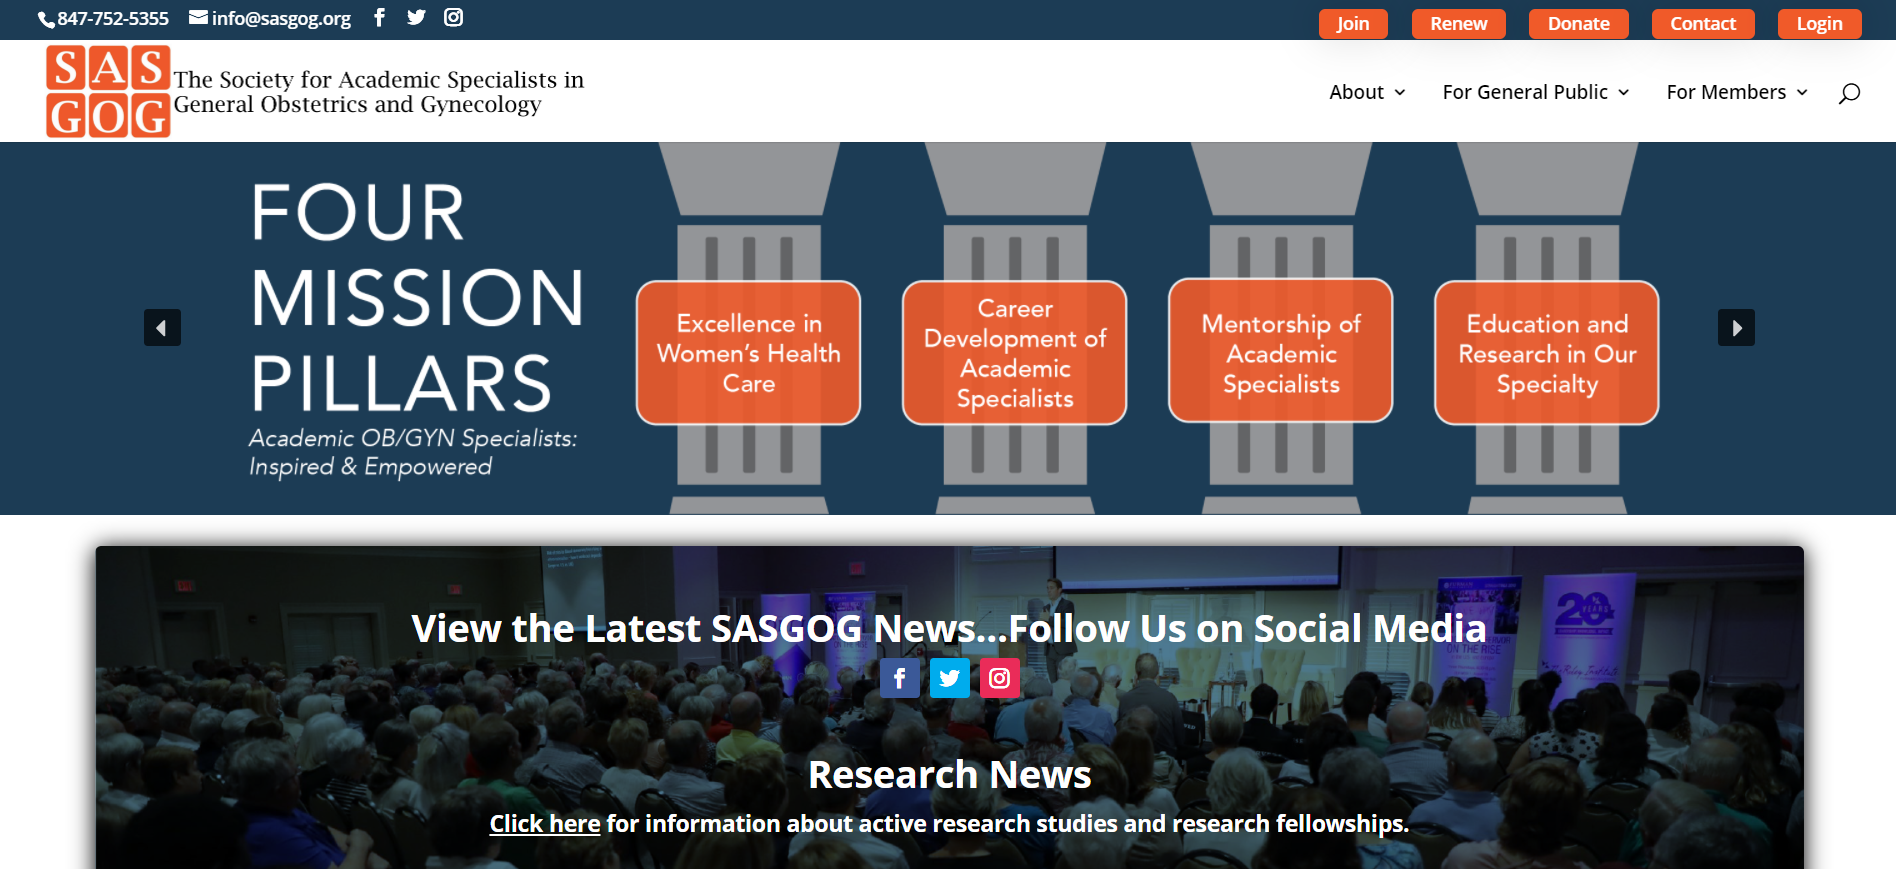 sasgog website screenshot